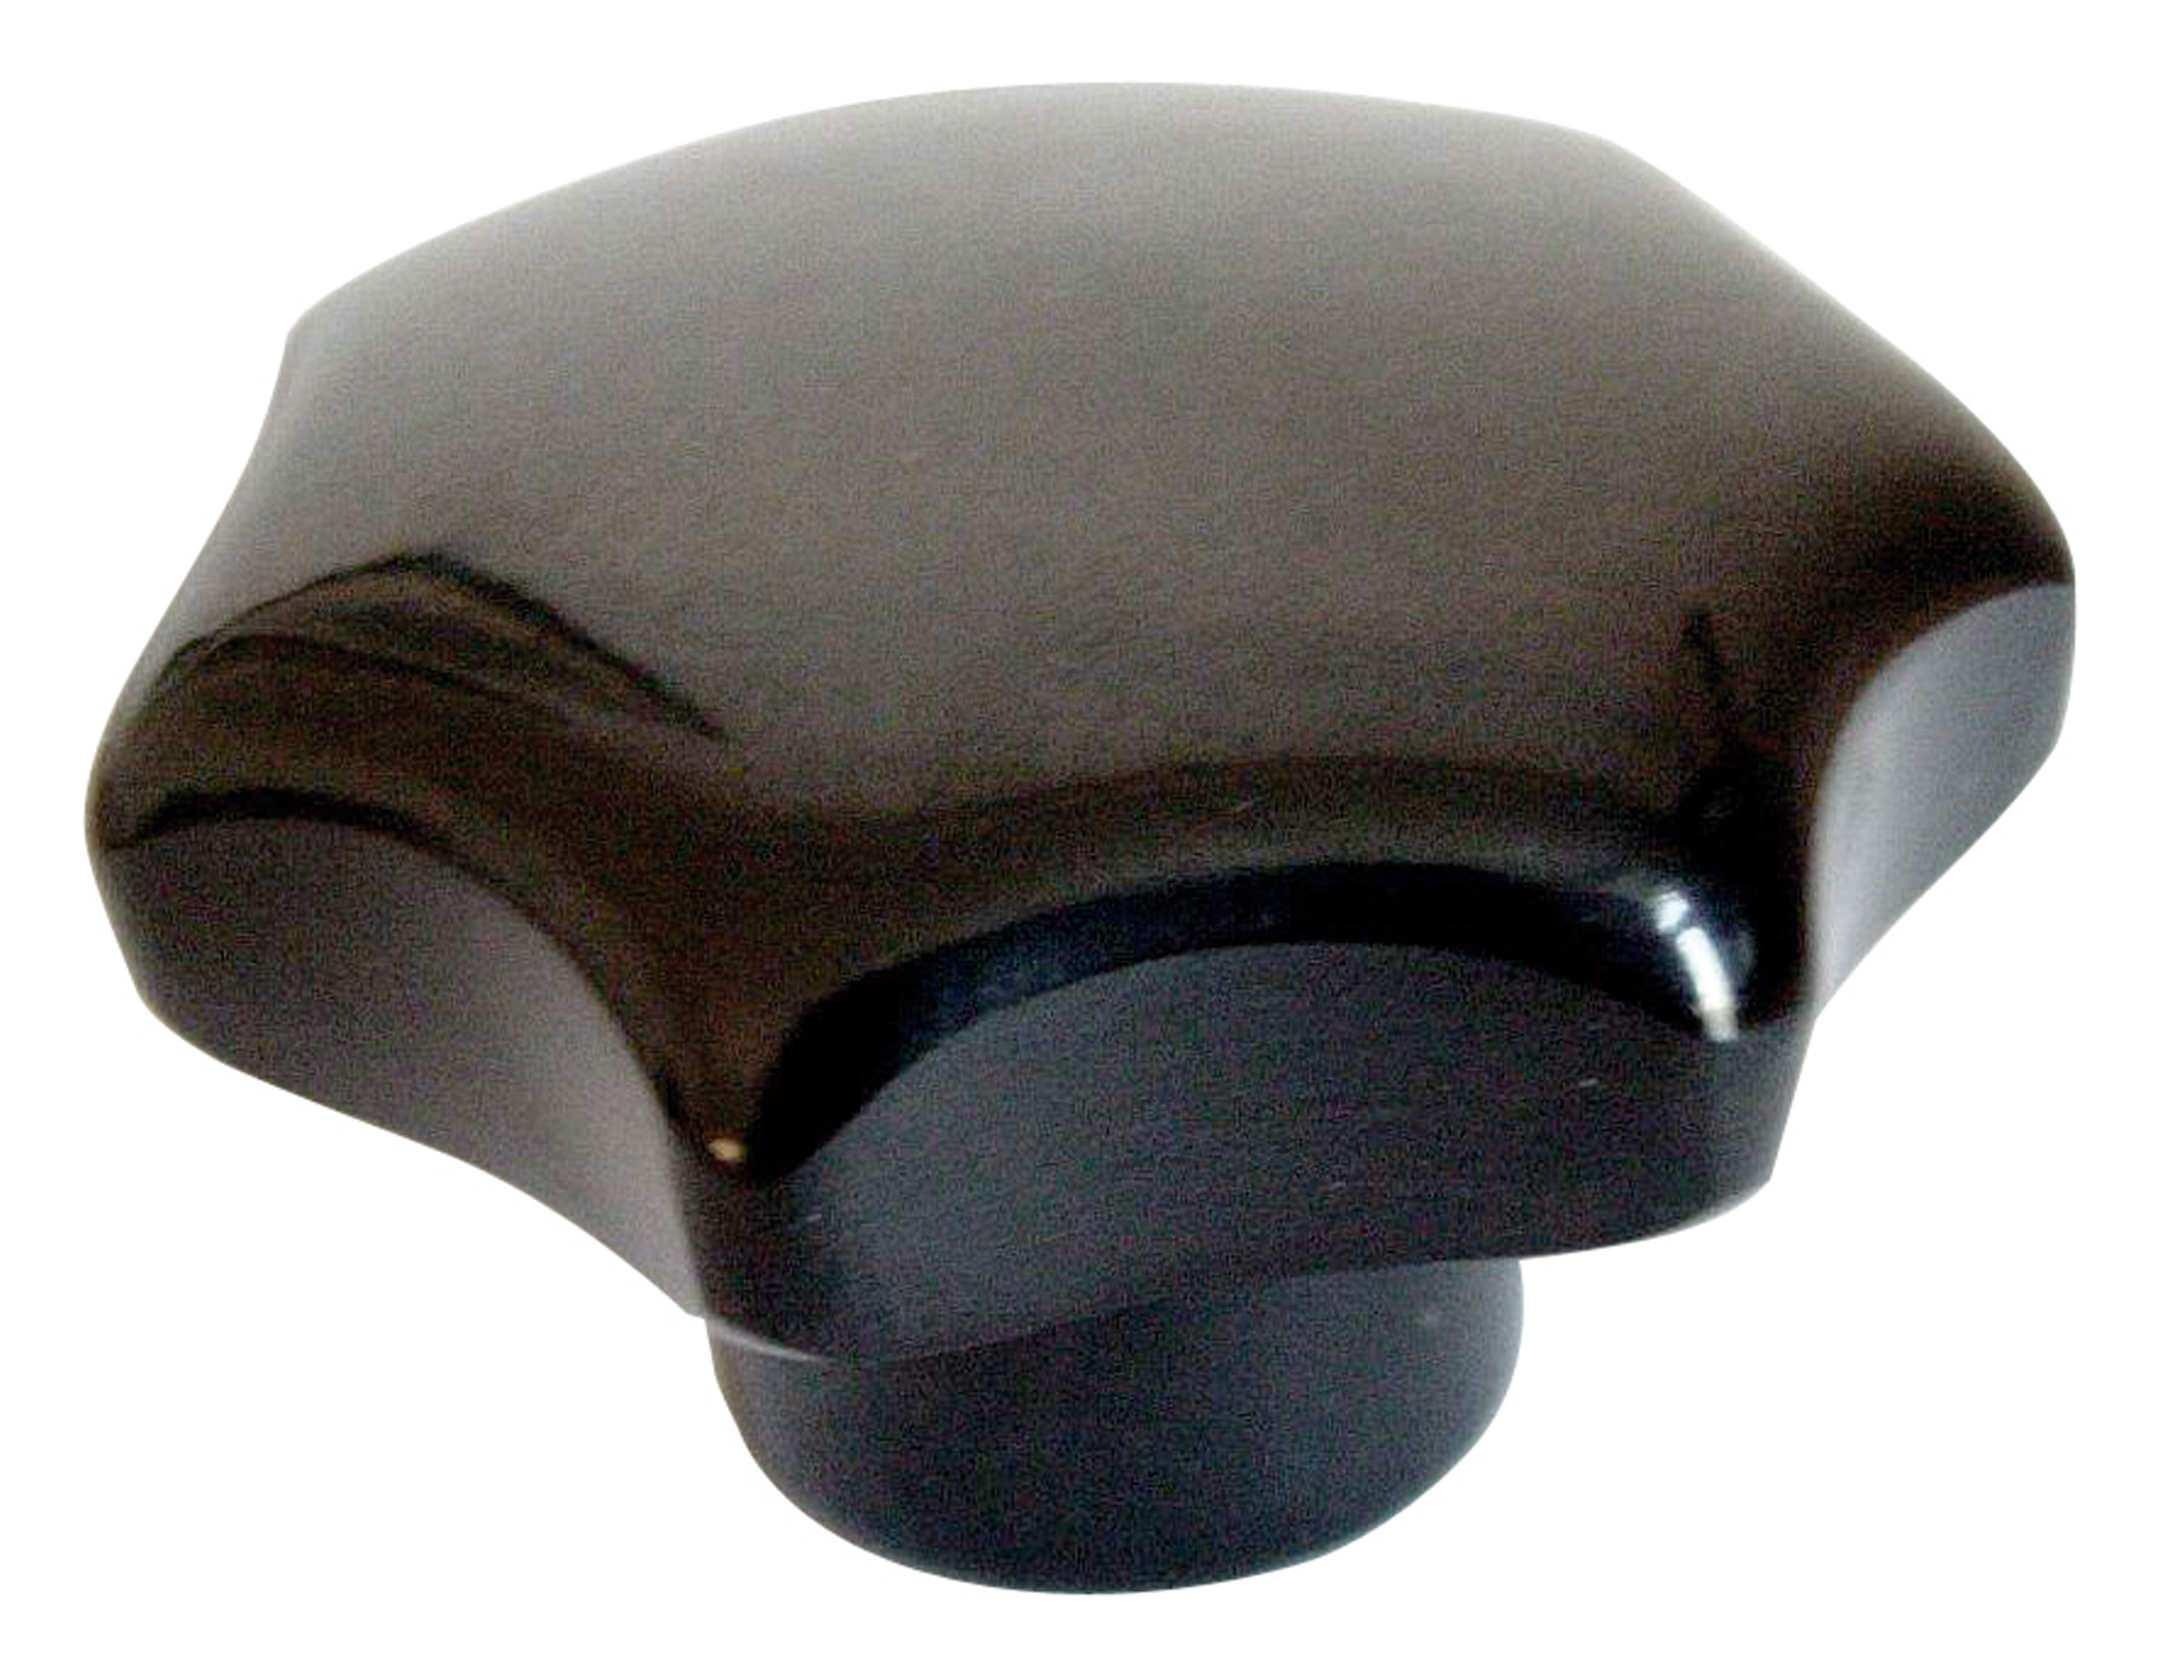 Sterngriff DIN 6336 K Ø40 M8 Duroplast Messing